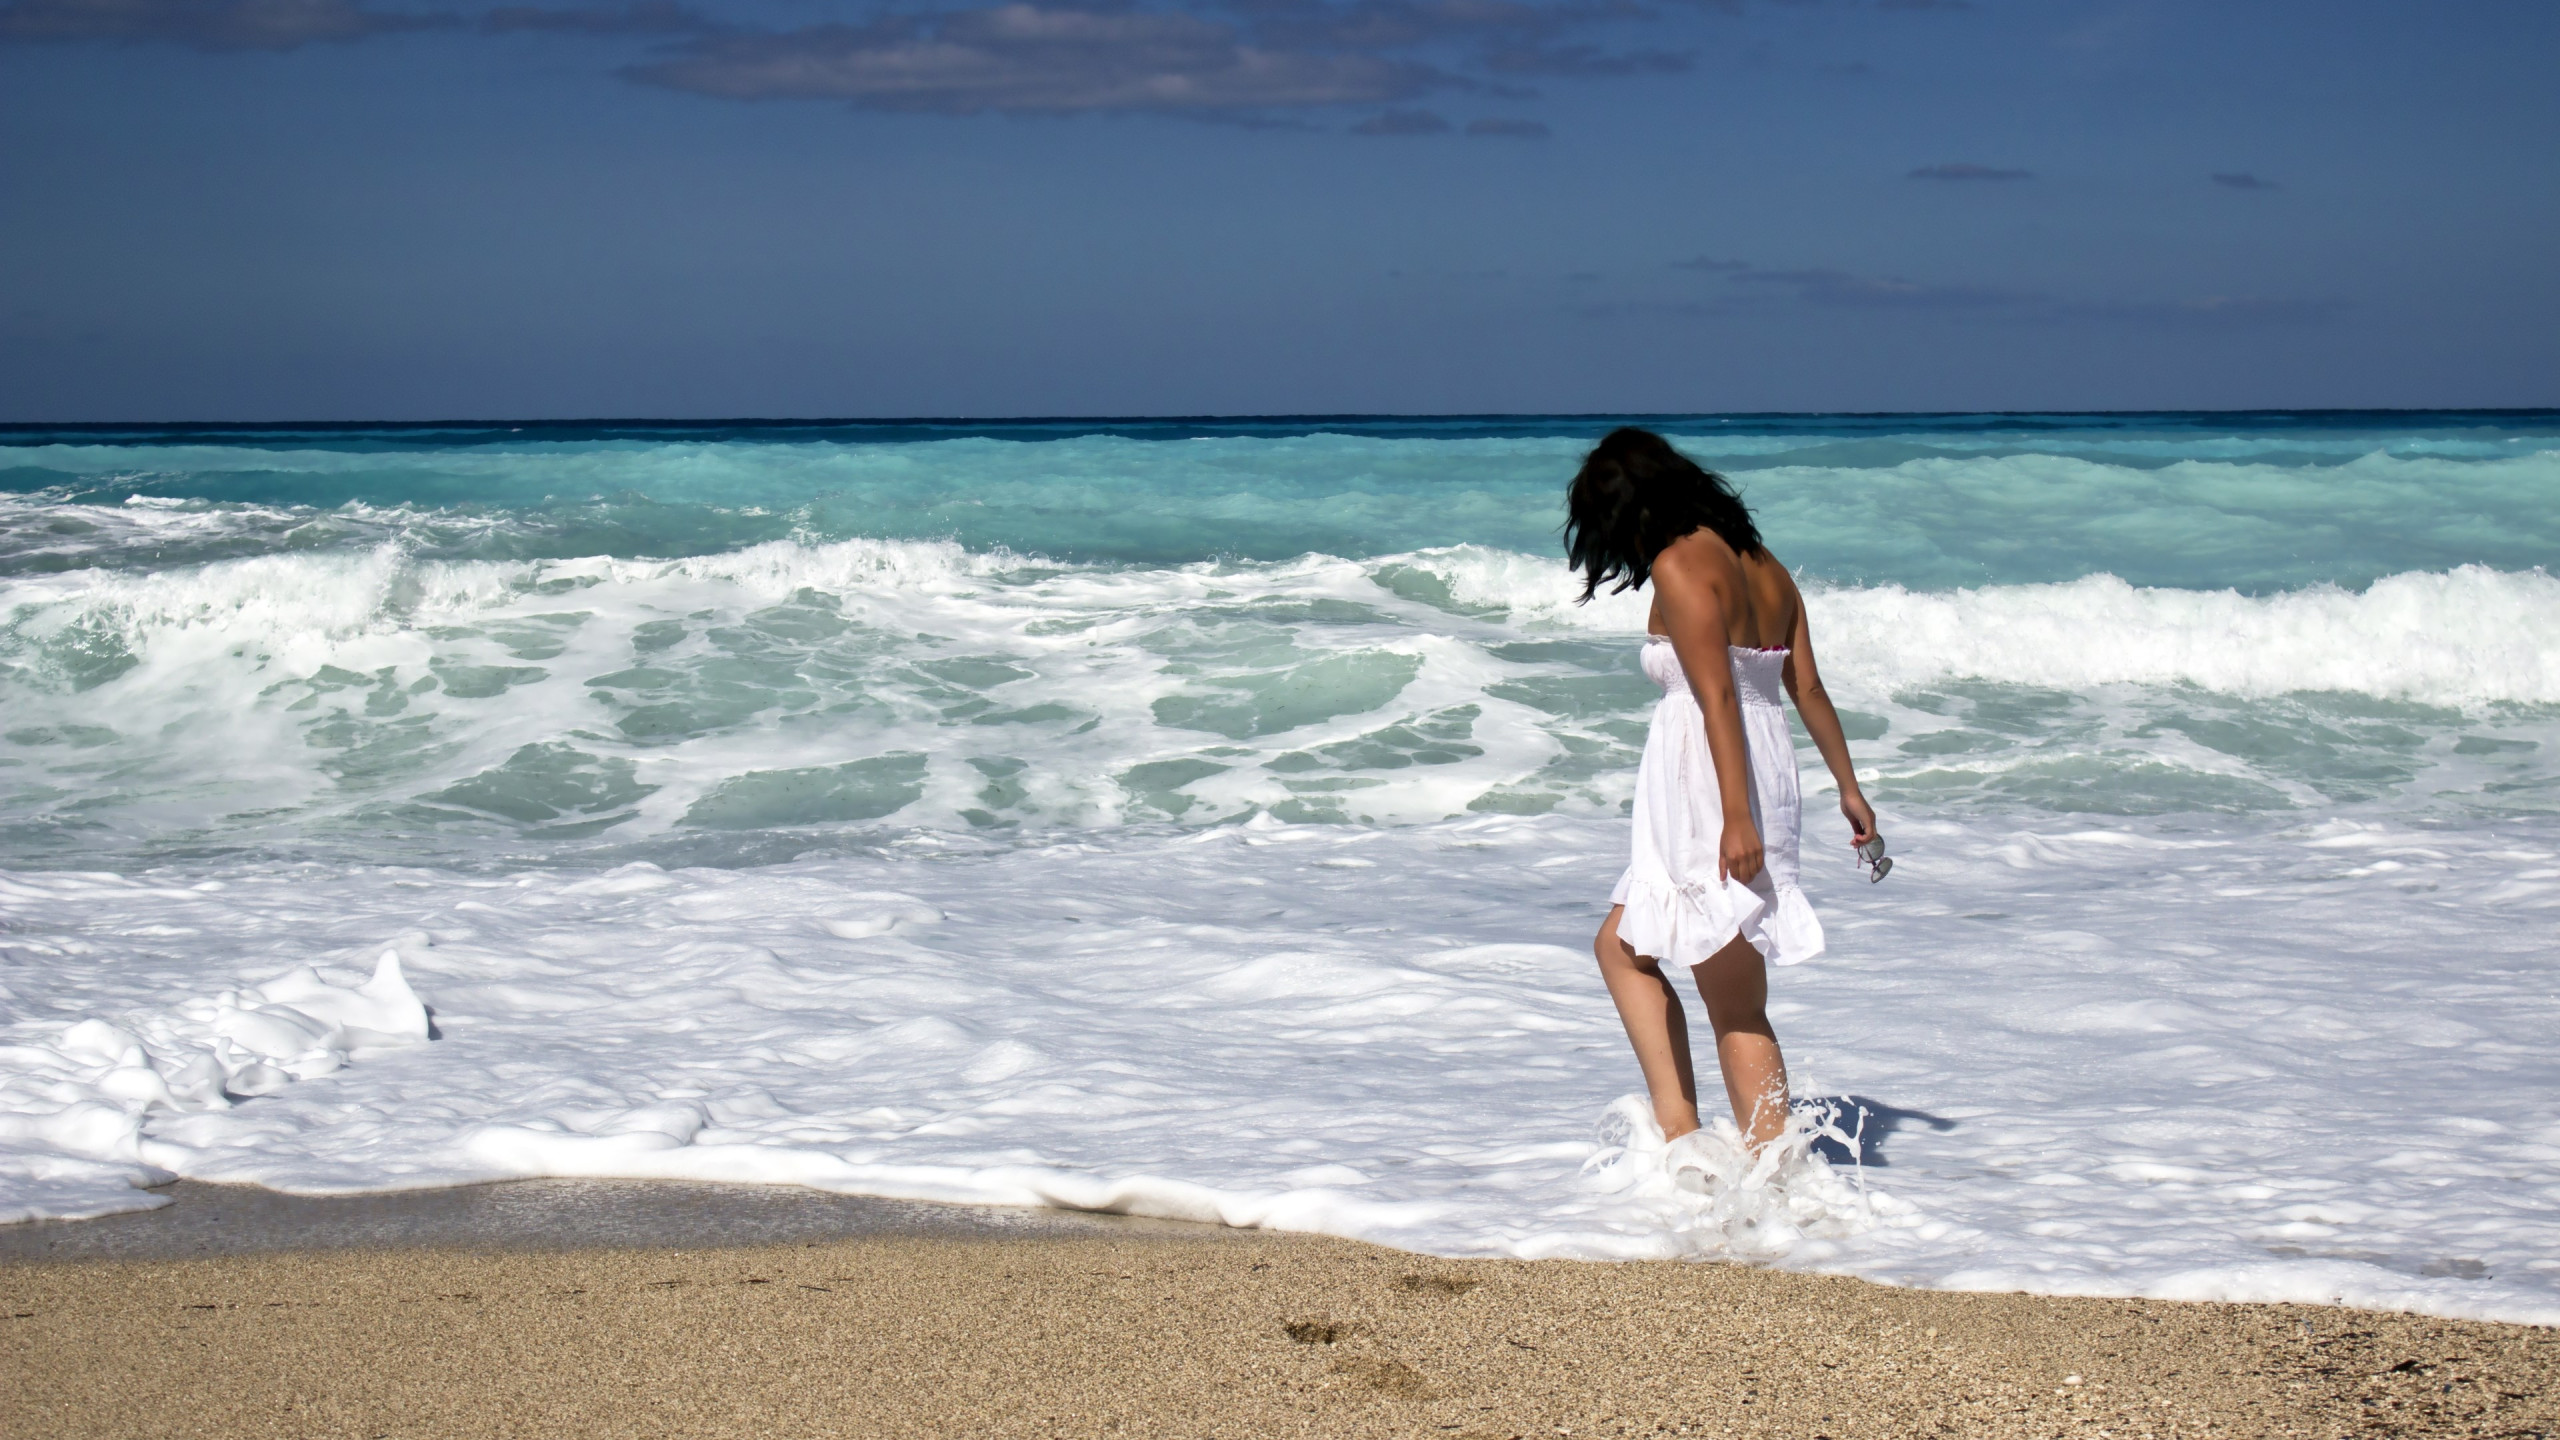 Download Wallpaper Girl On The Ocean Beach 2560x1440